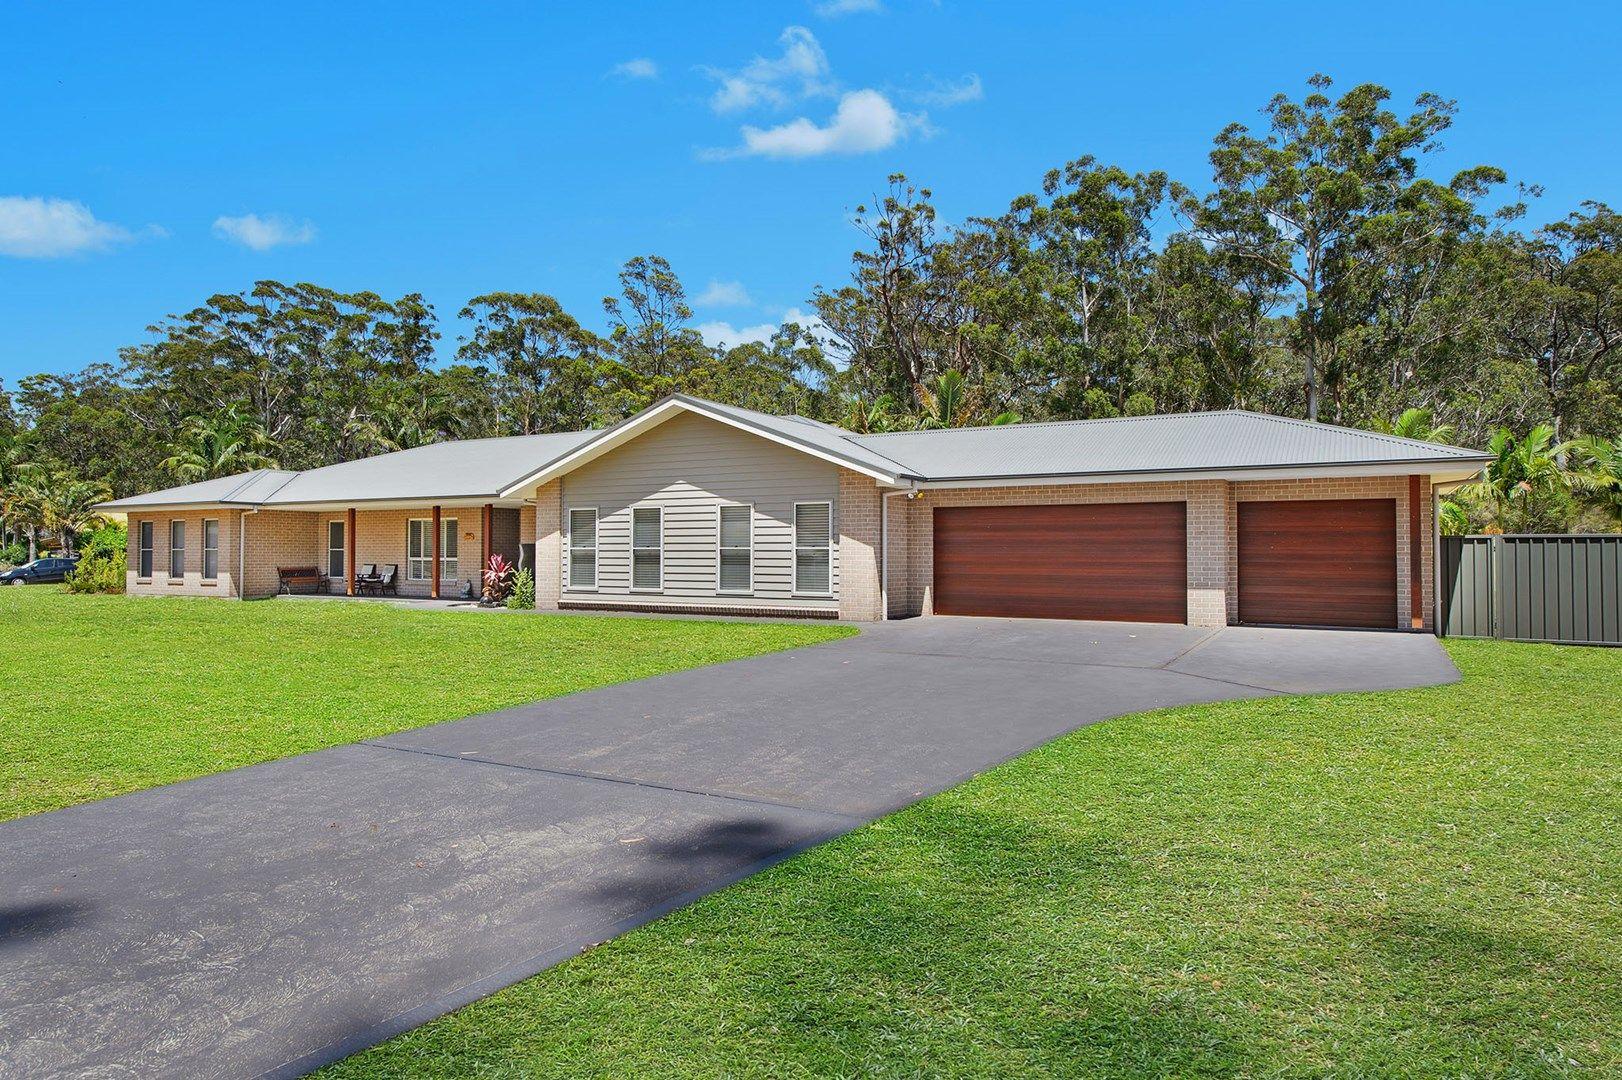 25 Lakeside Way, Lake Cathie NSW 2445, Image 0